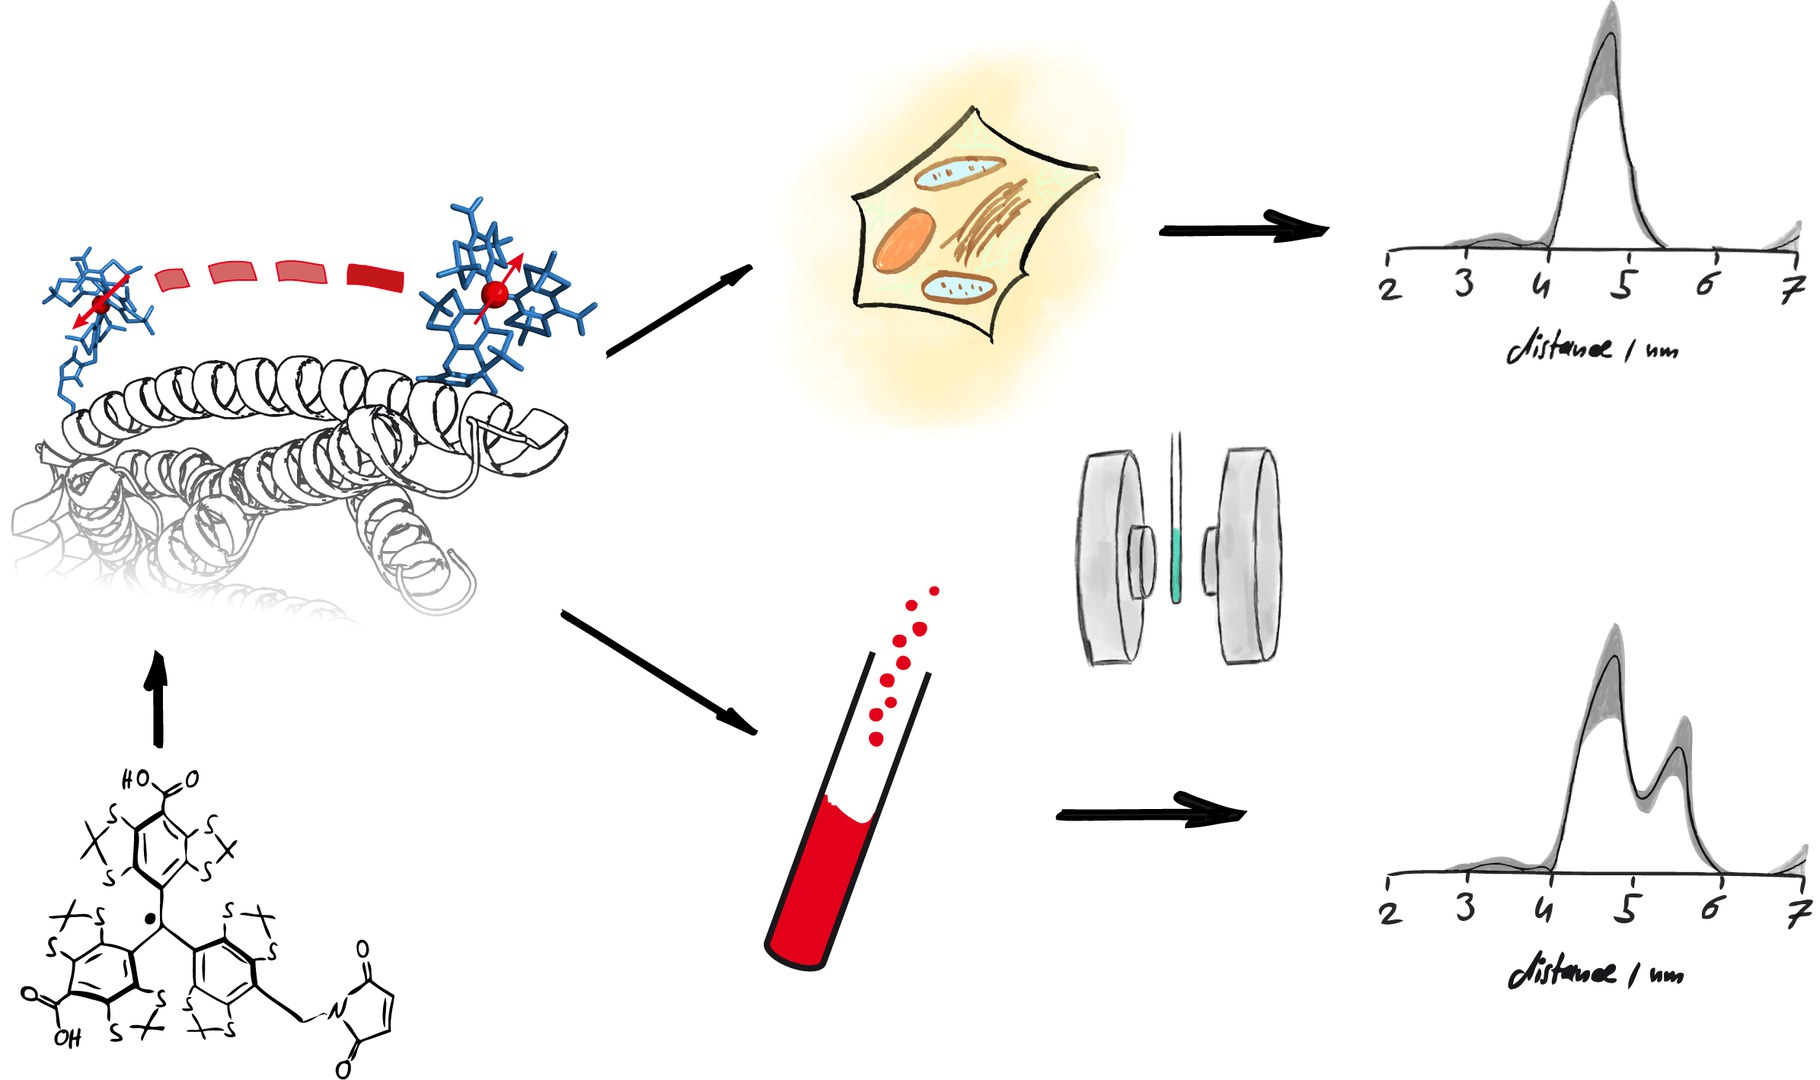 Schematic representation of the study: